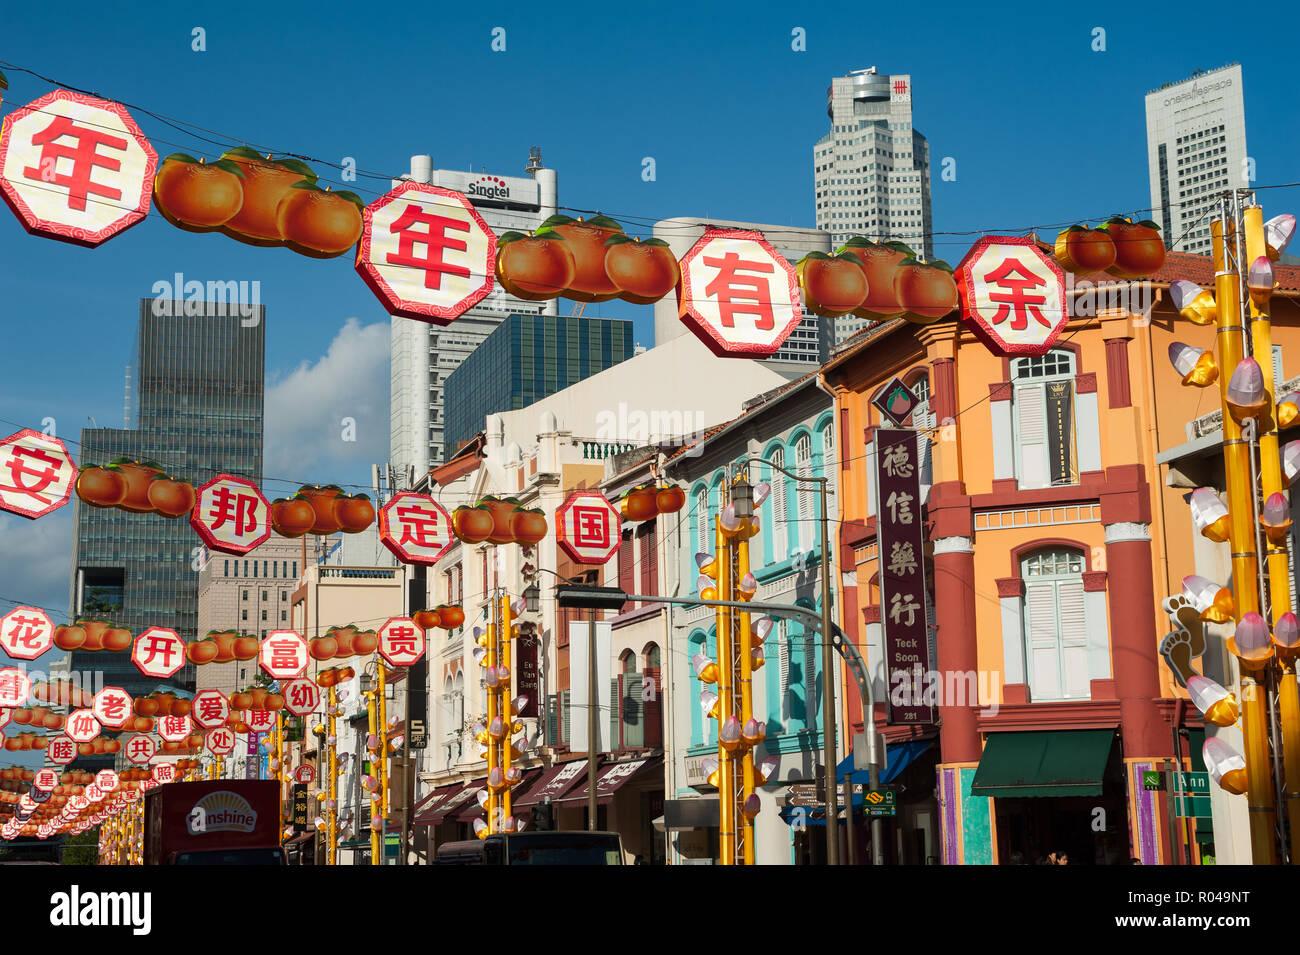 Singapore, Republic of Singapore, Colorful street scene in Chinatown - Stock Image